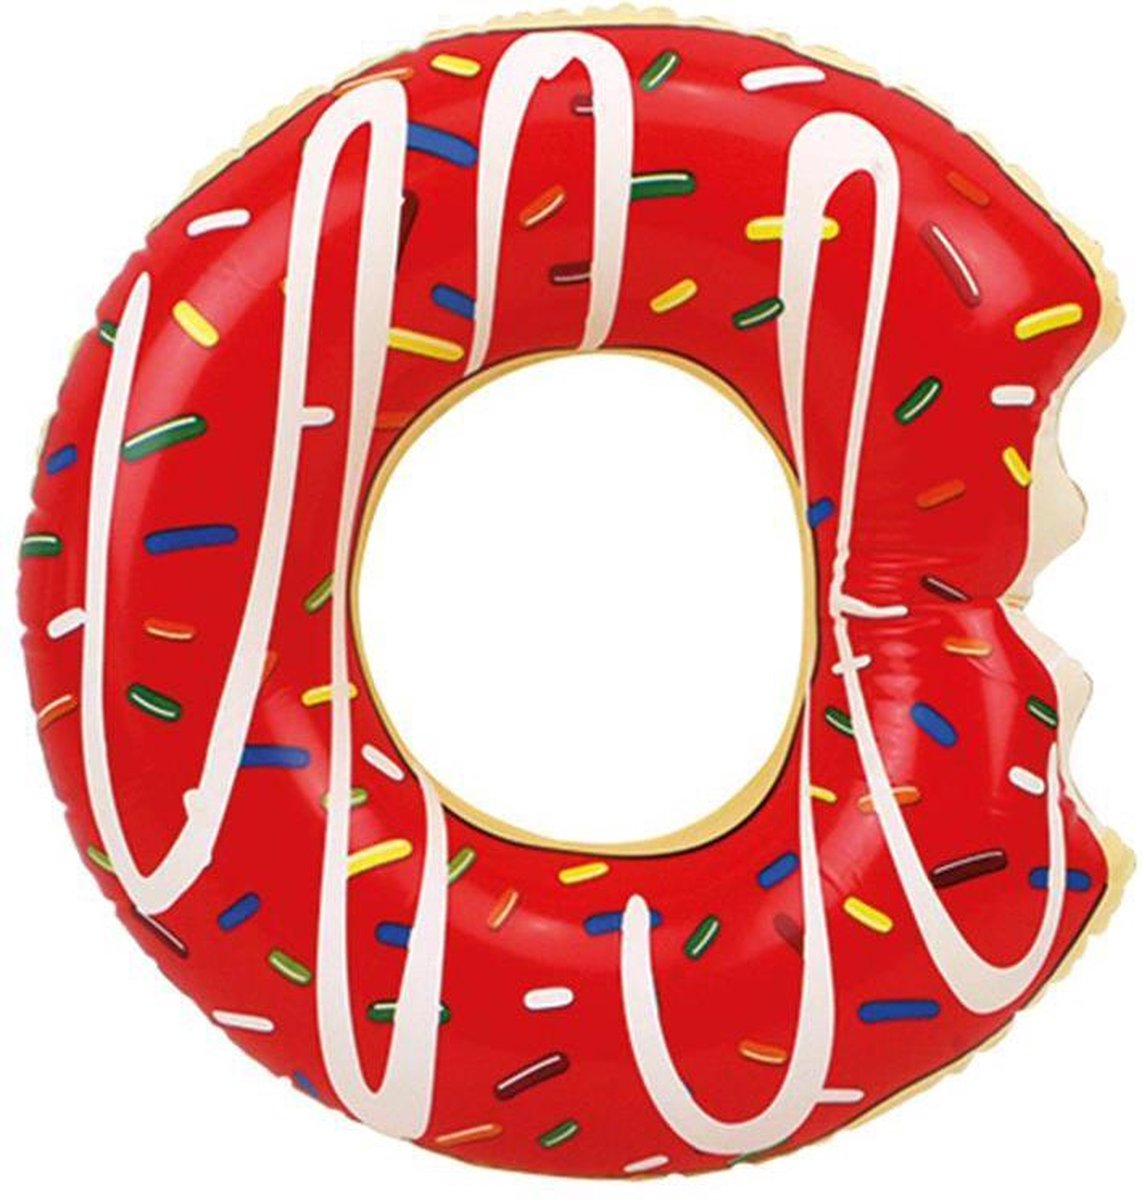 Opblaasband Donut - Doorsnede 61 cm